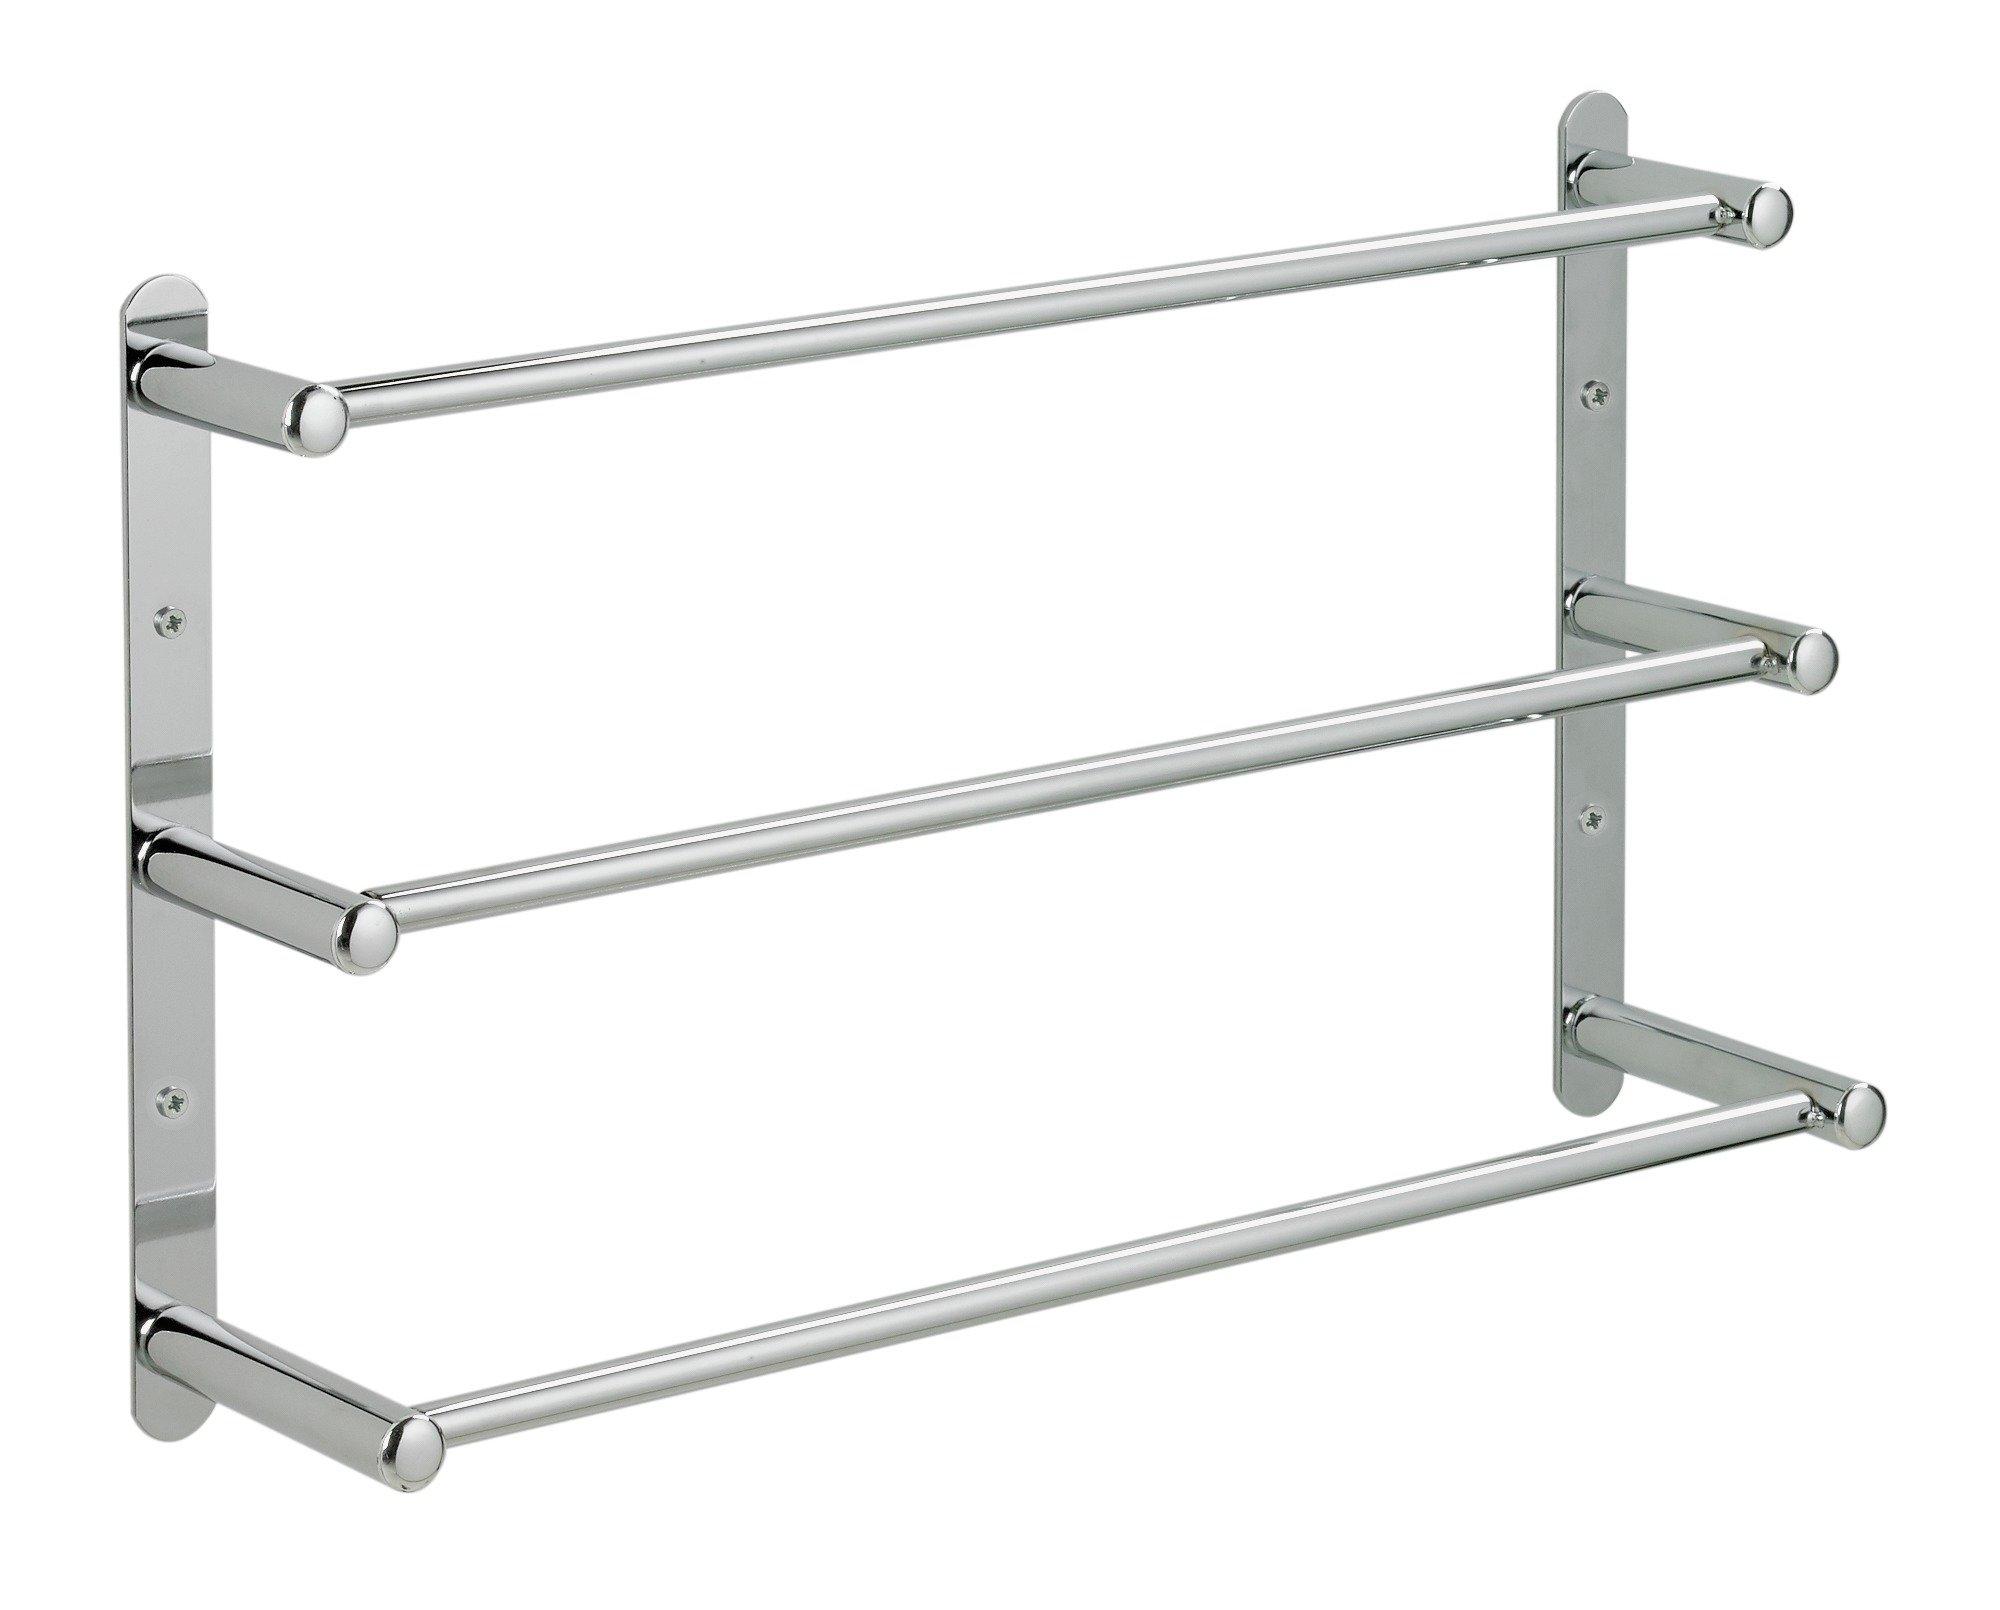 argos home 3 tier wall mounted towel rack port. Black Bedroom Furniture Sets. Home Design Ideas